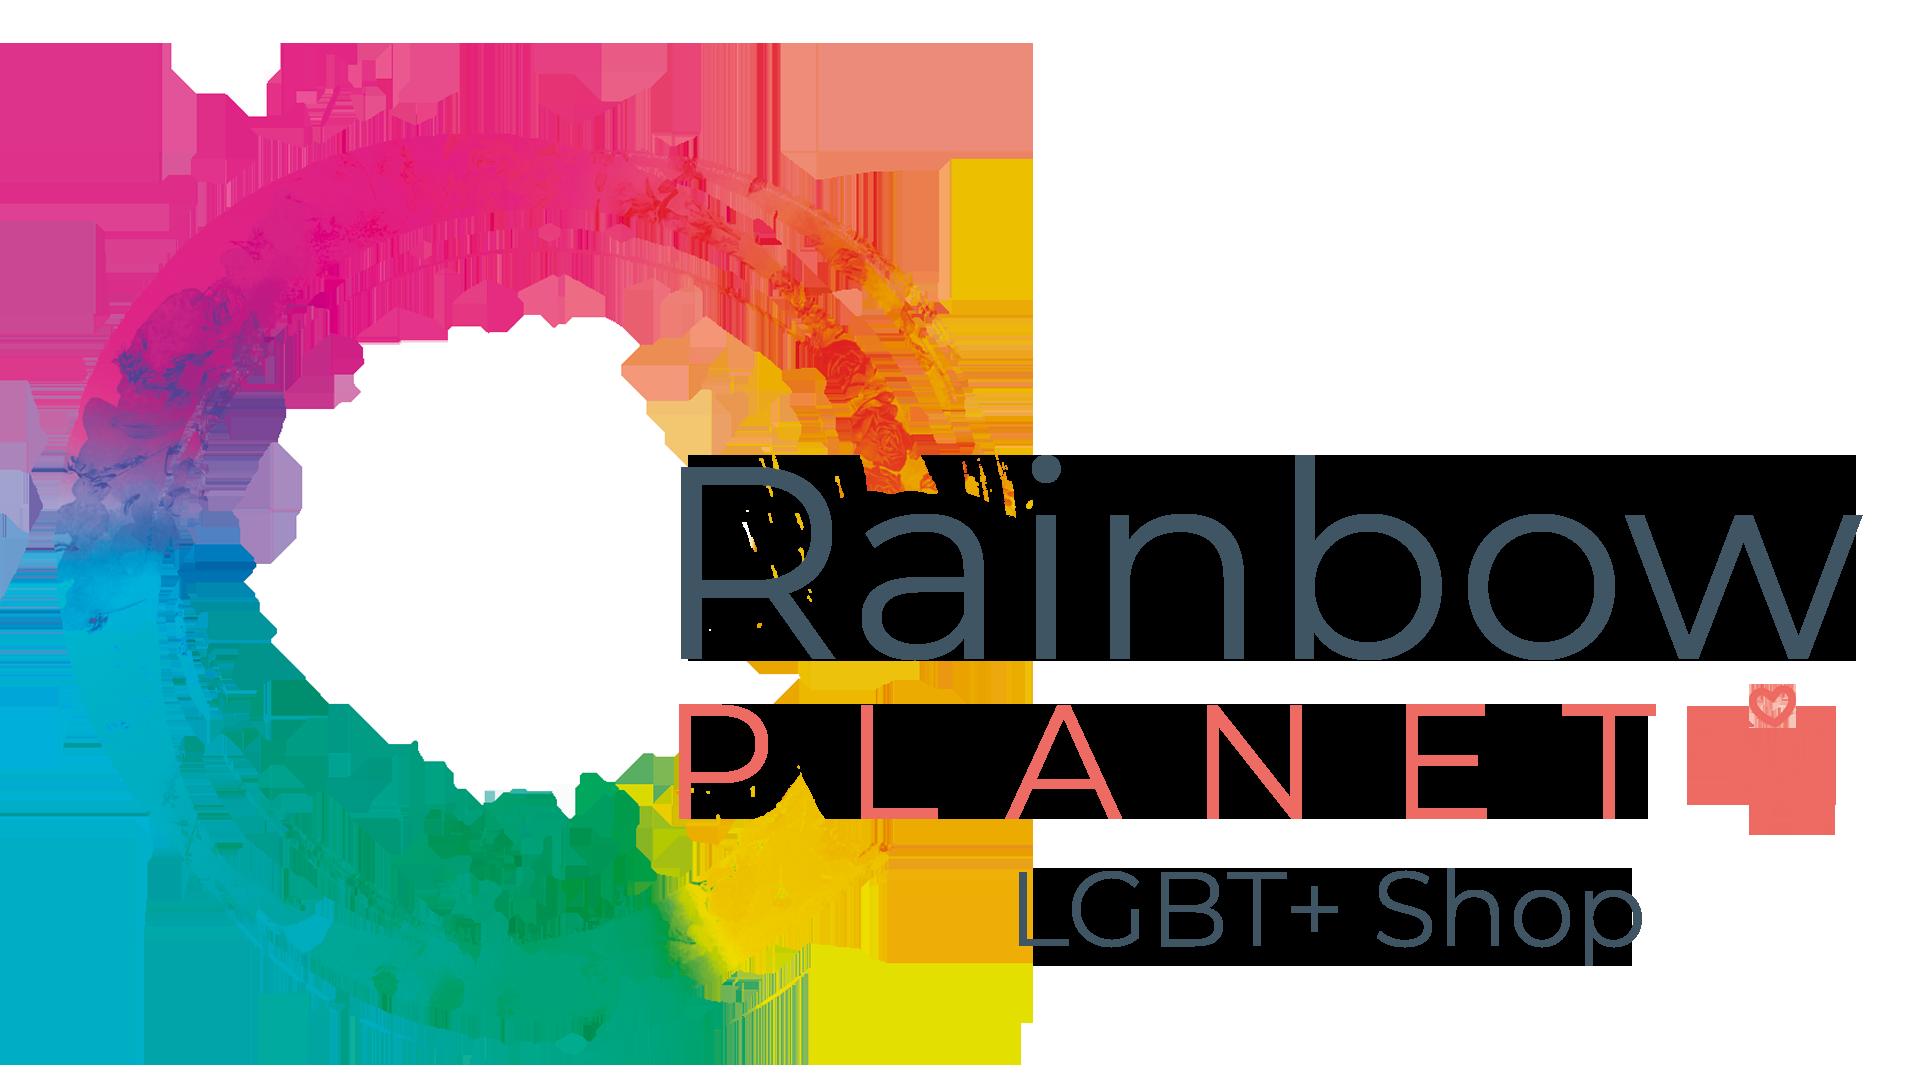 RAINBOW PLANET – LGBT+ Shop